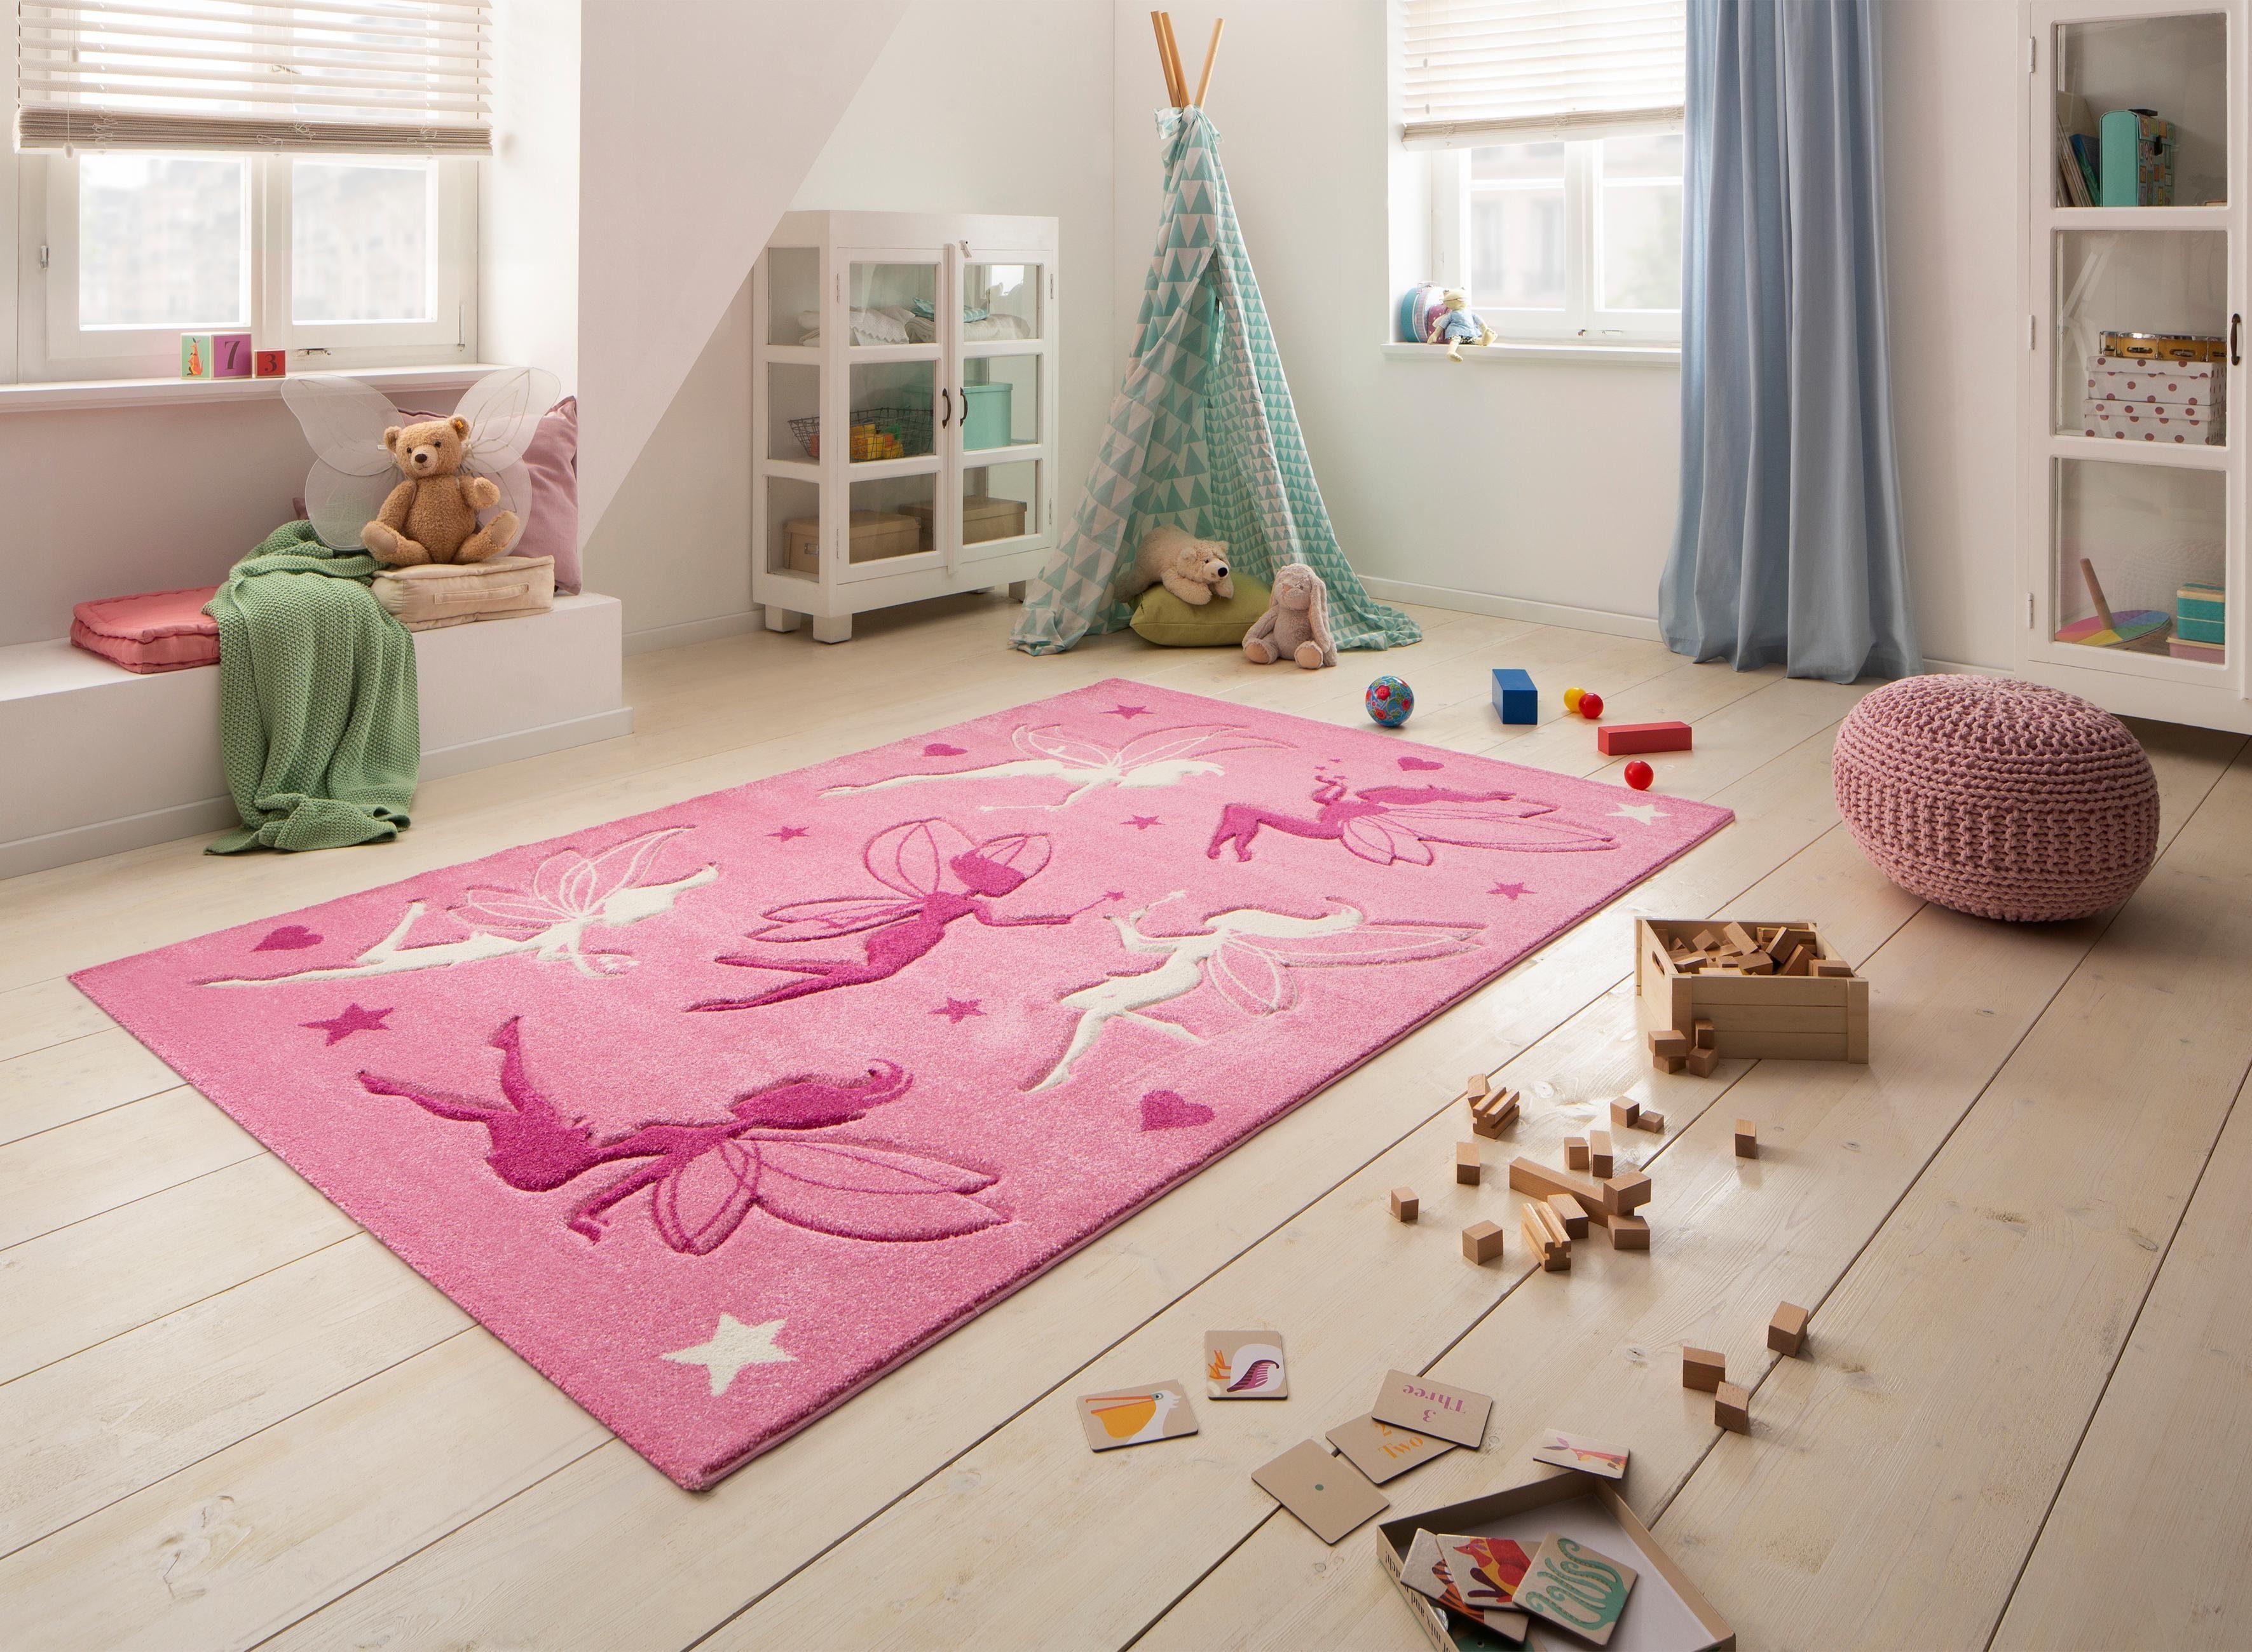 Vloerkleed Kinderkamer Roze : Vloerkleed voor de kinderkamer fee« lüttenhütt motiefmodel